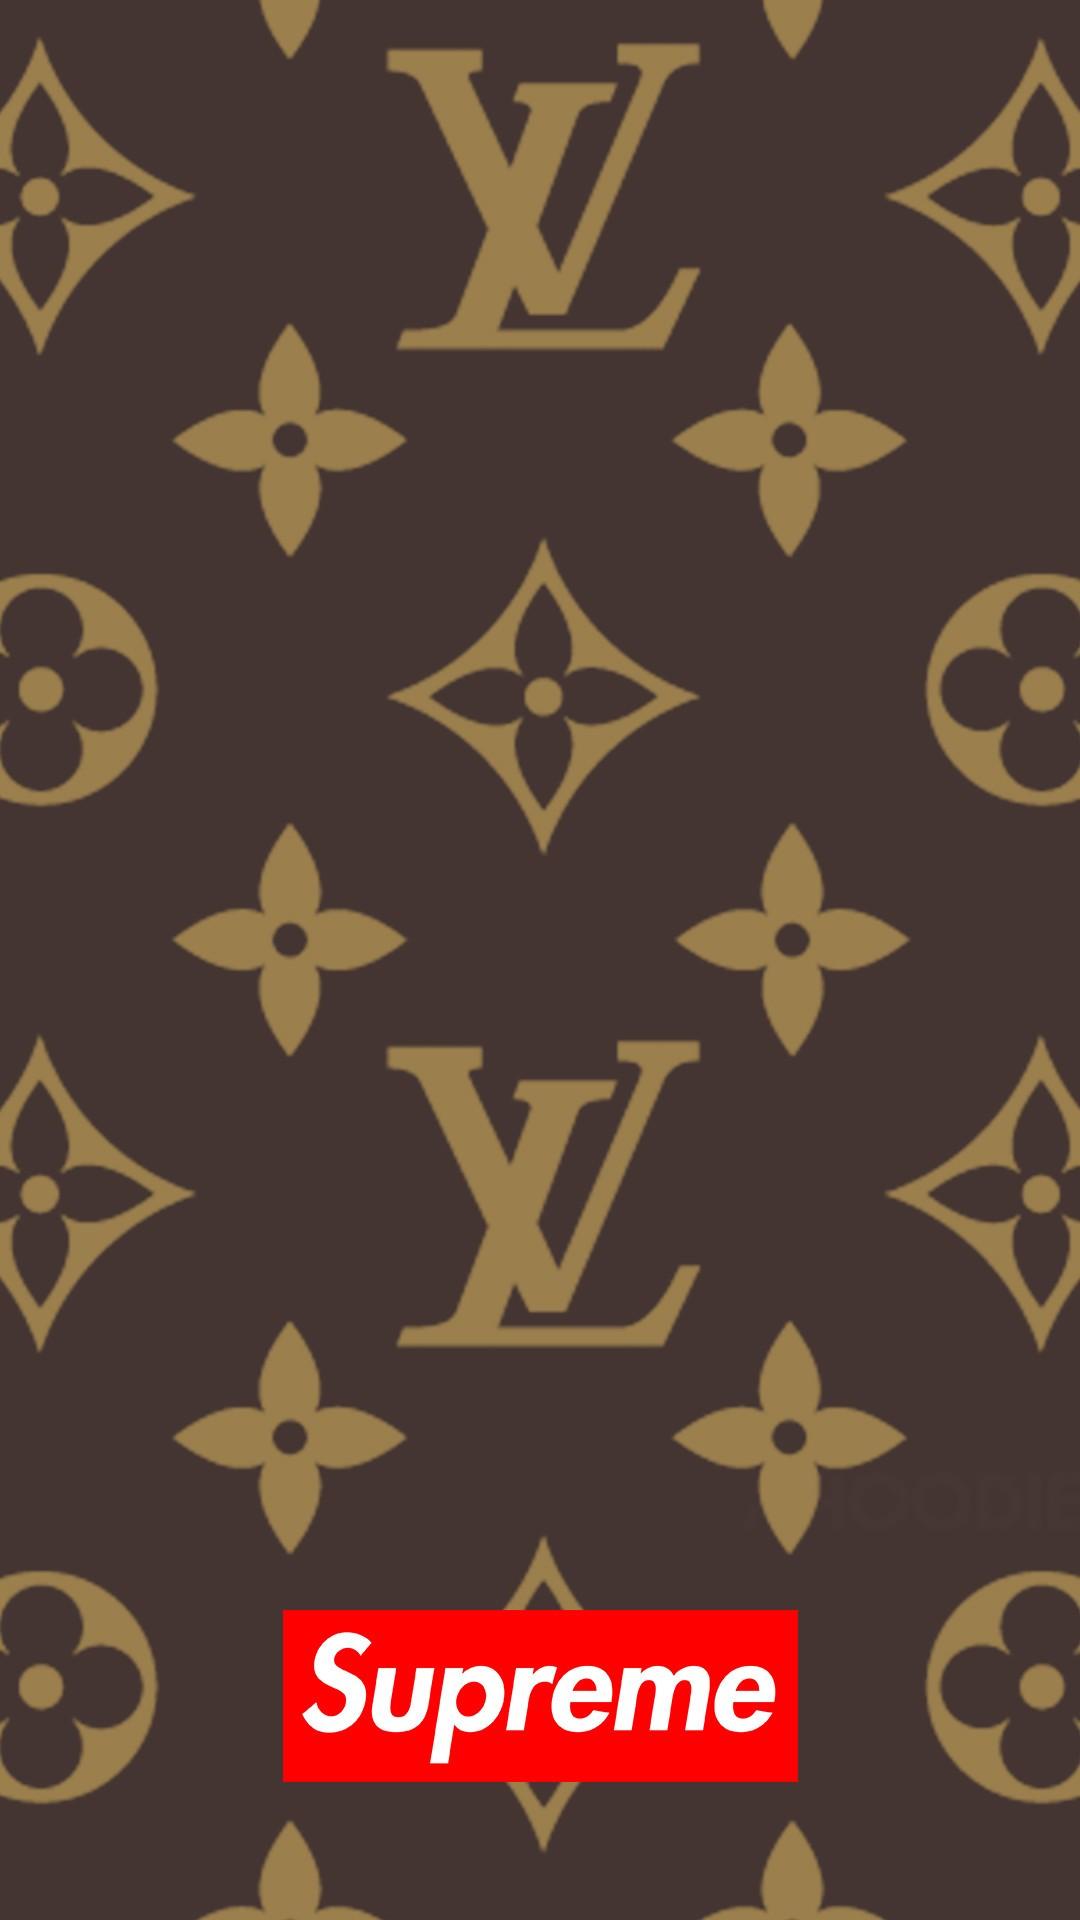 Supreme x Louis Vuitton iPhone Wallpaper 1080x1920